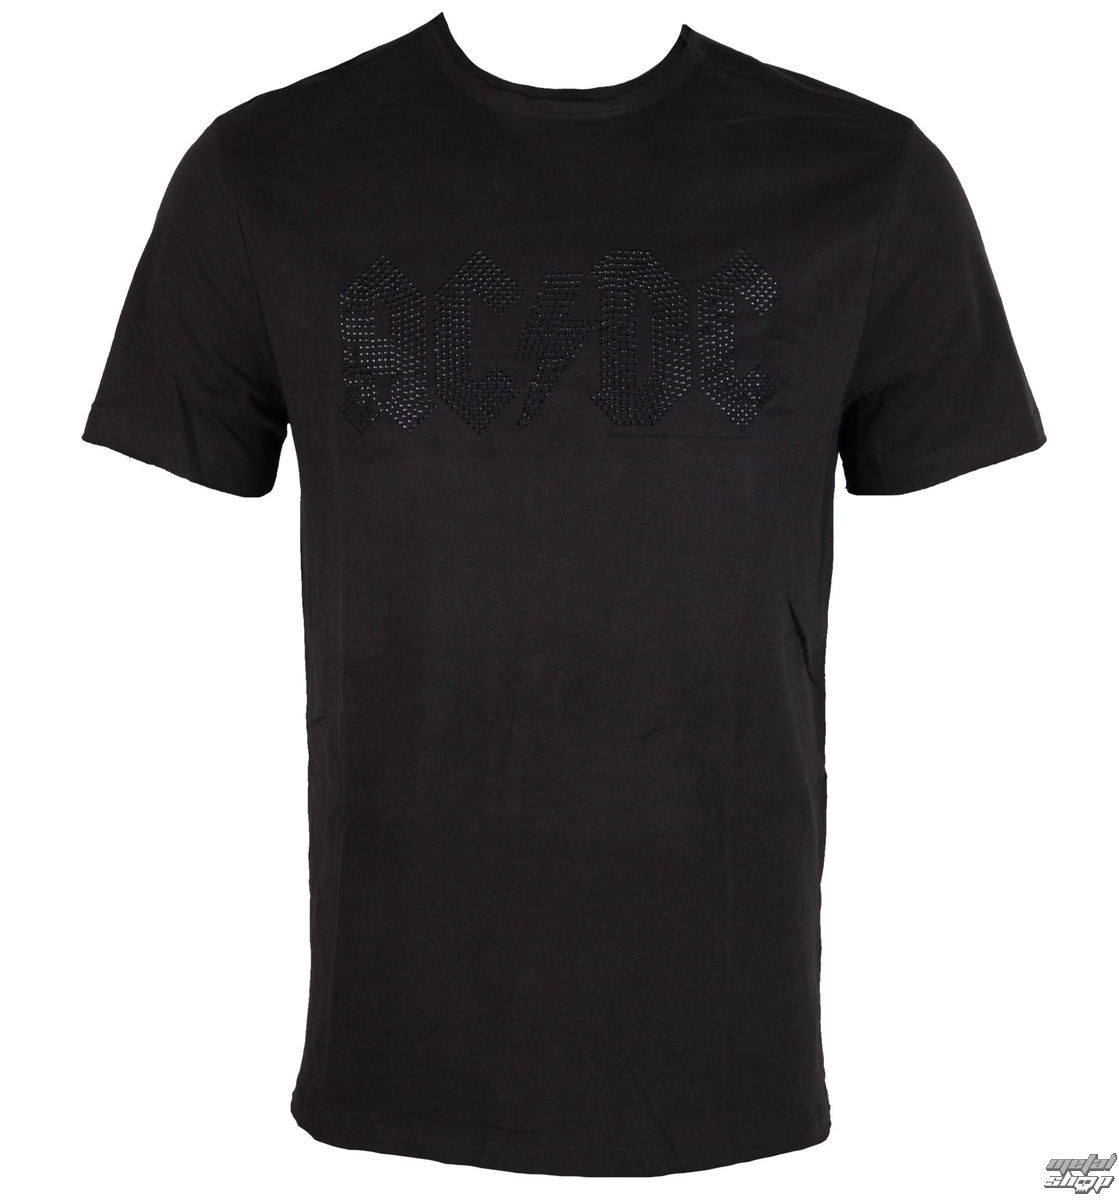 3f2c0ec2840d tričko pánské AC DC - CLASSIC LOGO CHARCOAL BLACK - AMPLIFIED ...